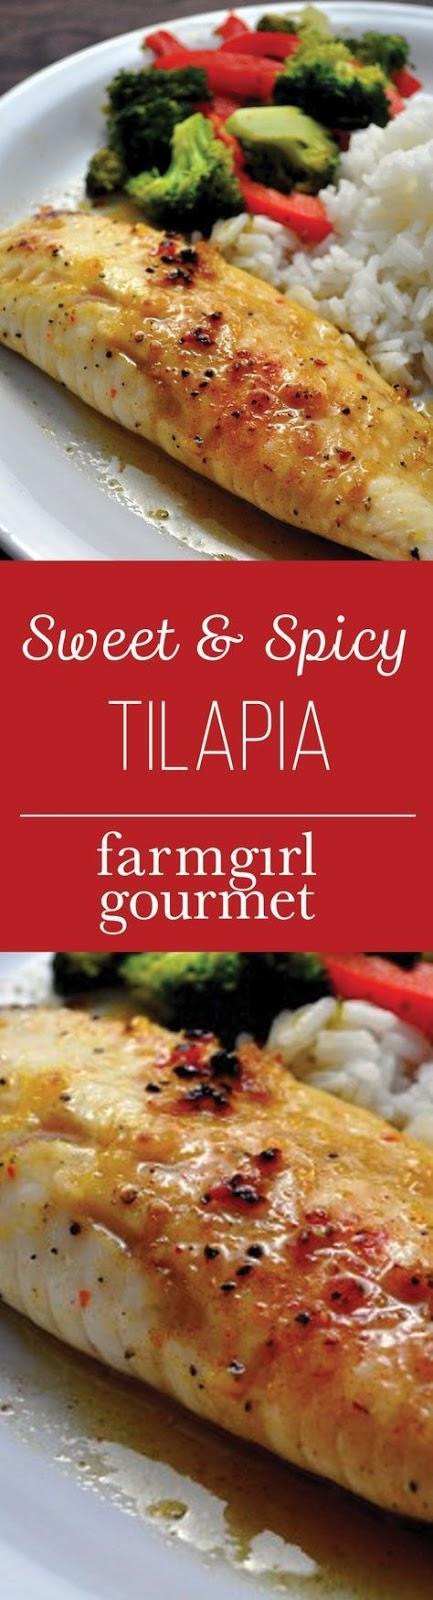 Sweet & Spicy Tilapia